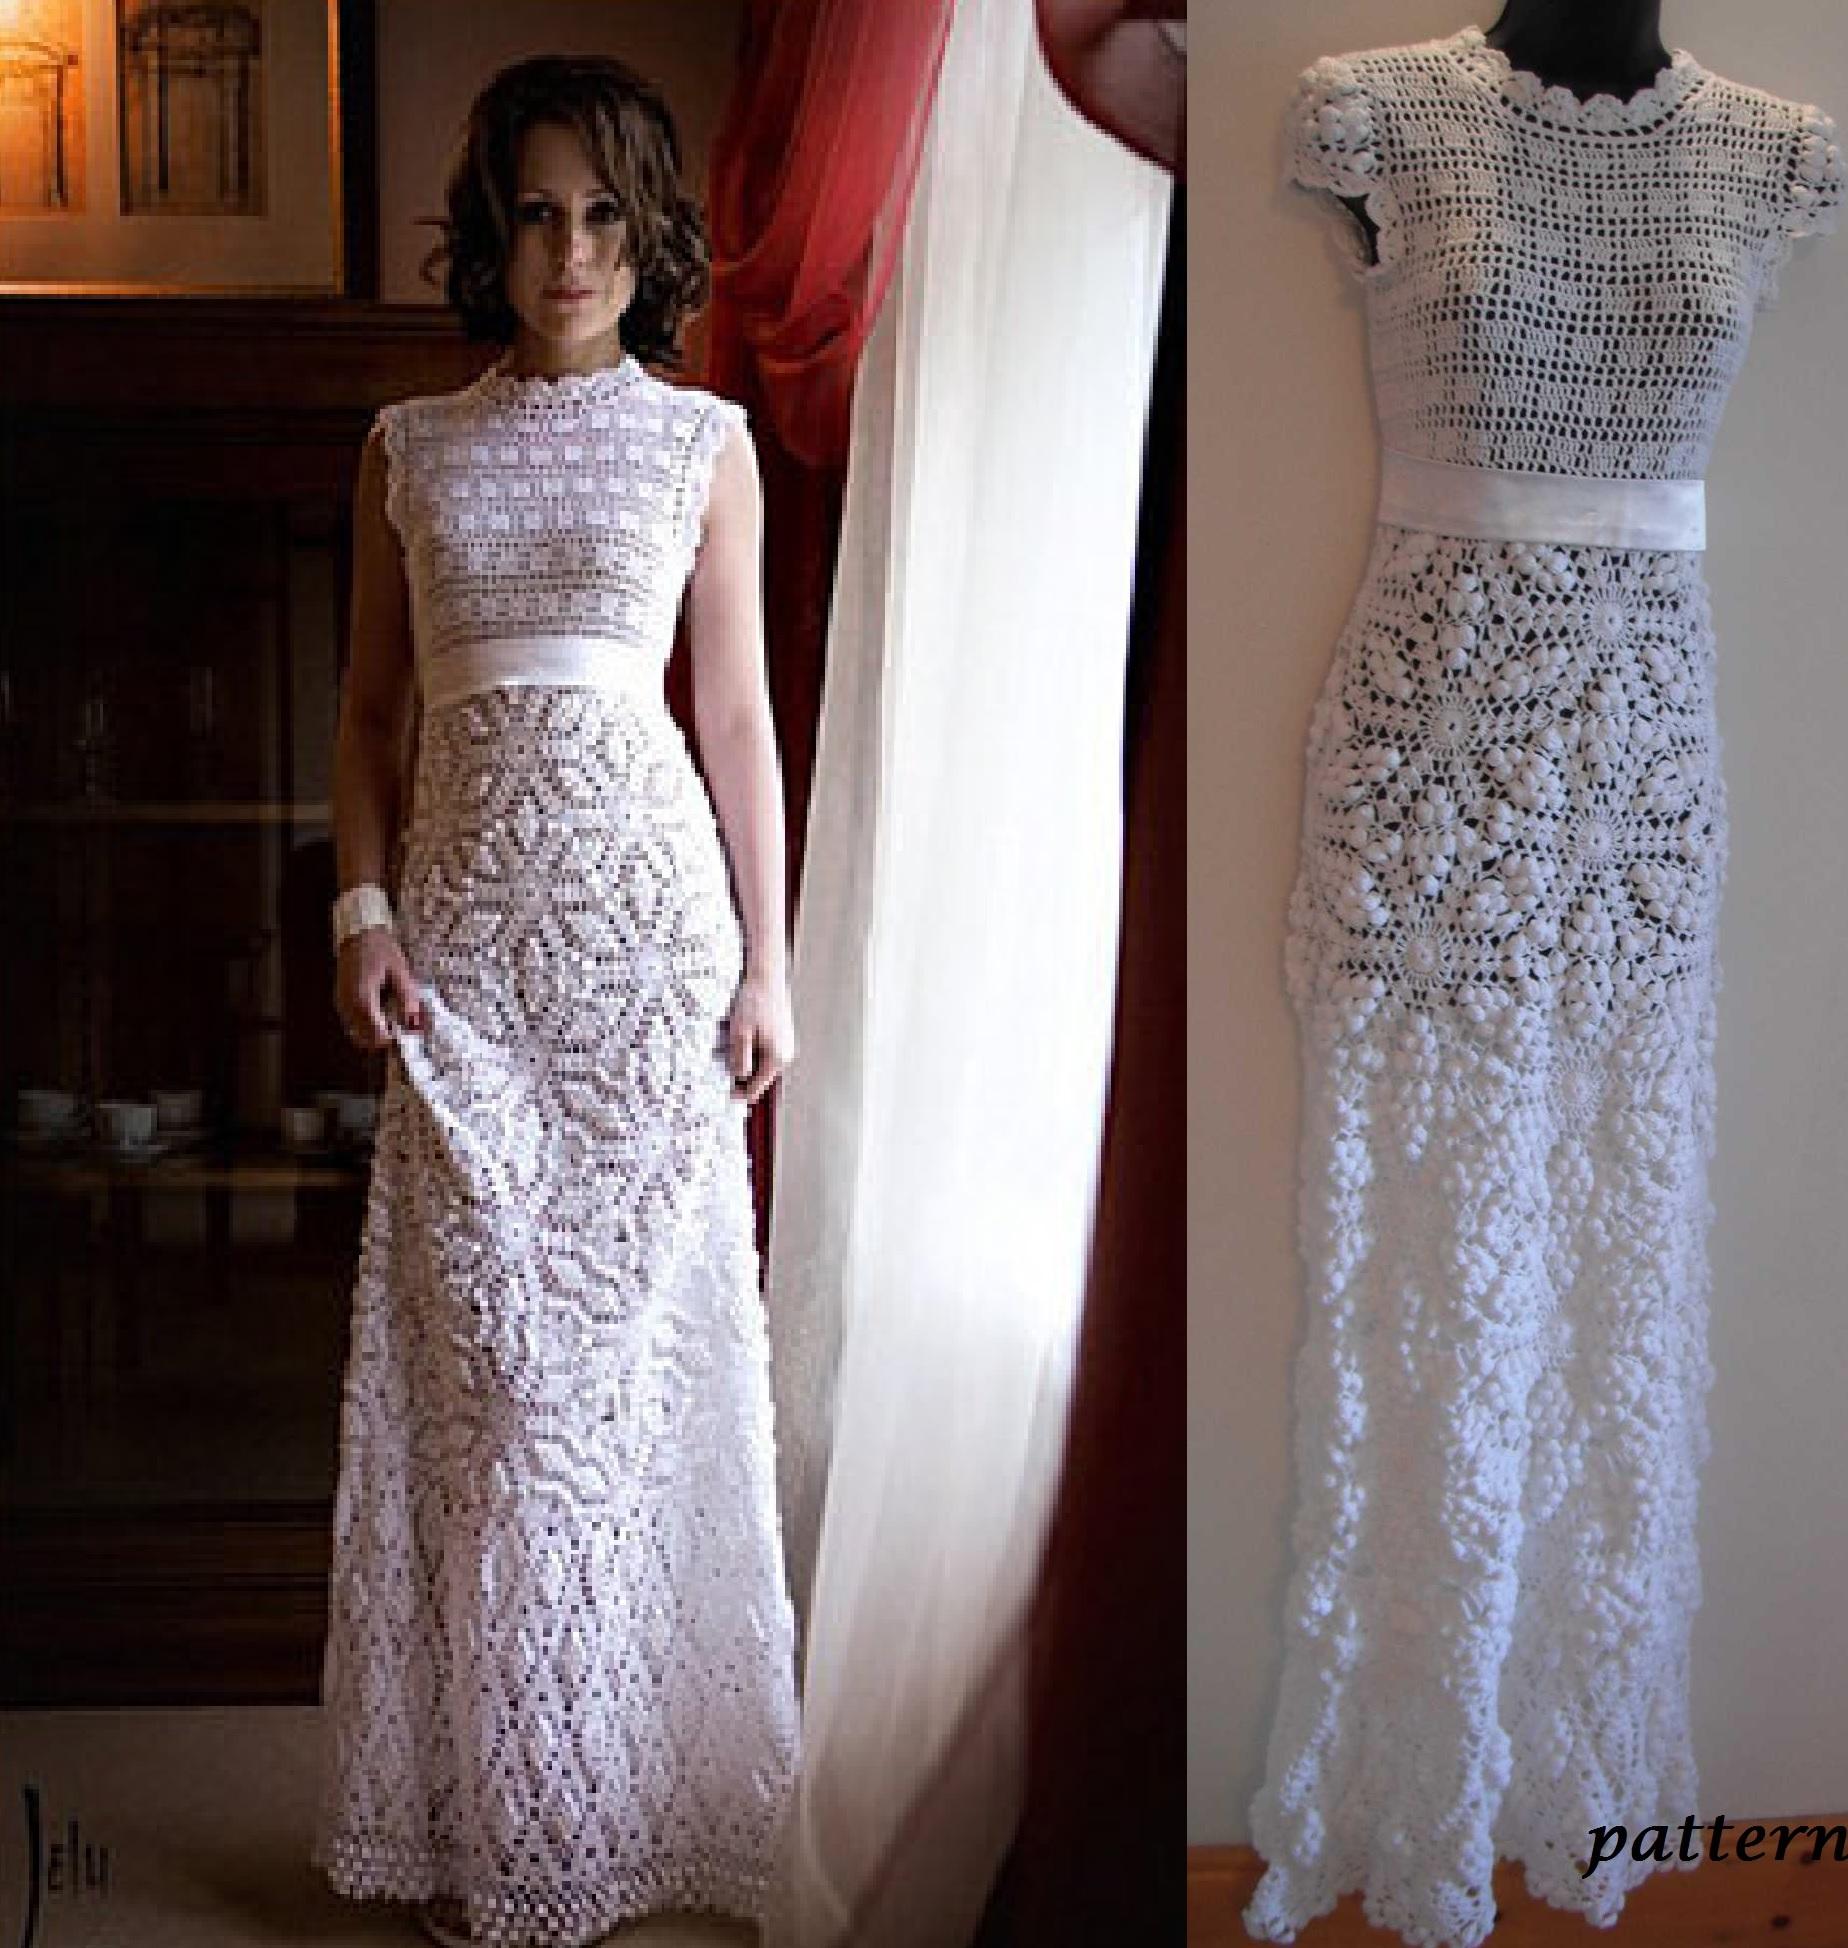 Crochet Wedding Dress.Crochet Wedding Dress Pattern Pdf By Marifu6a